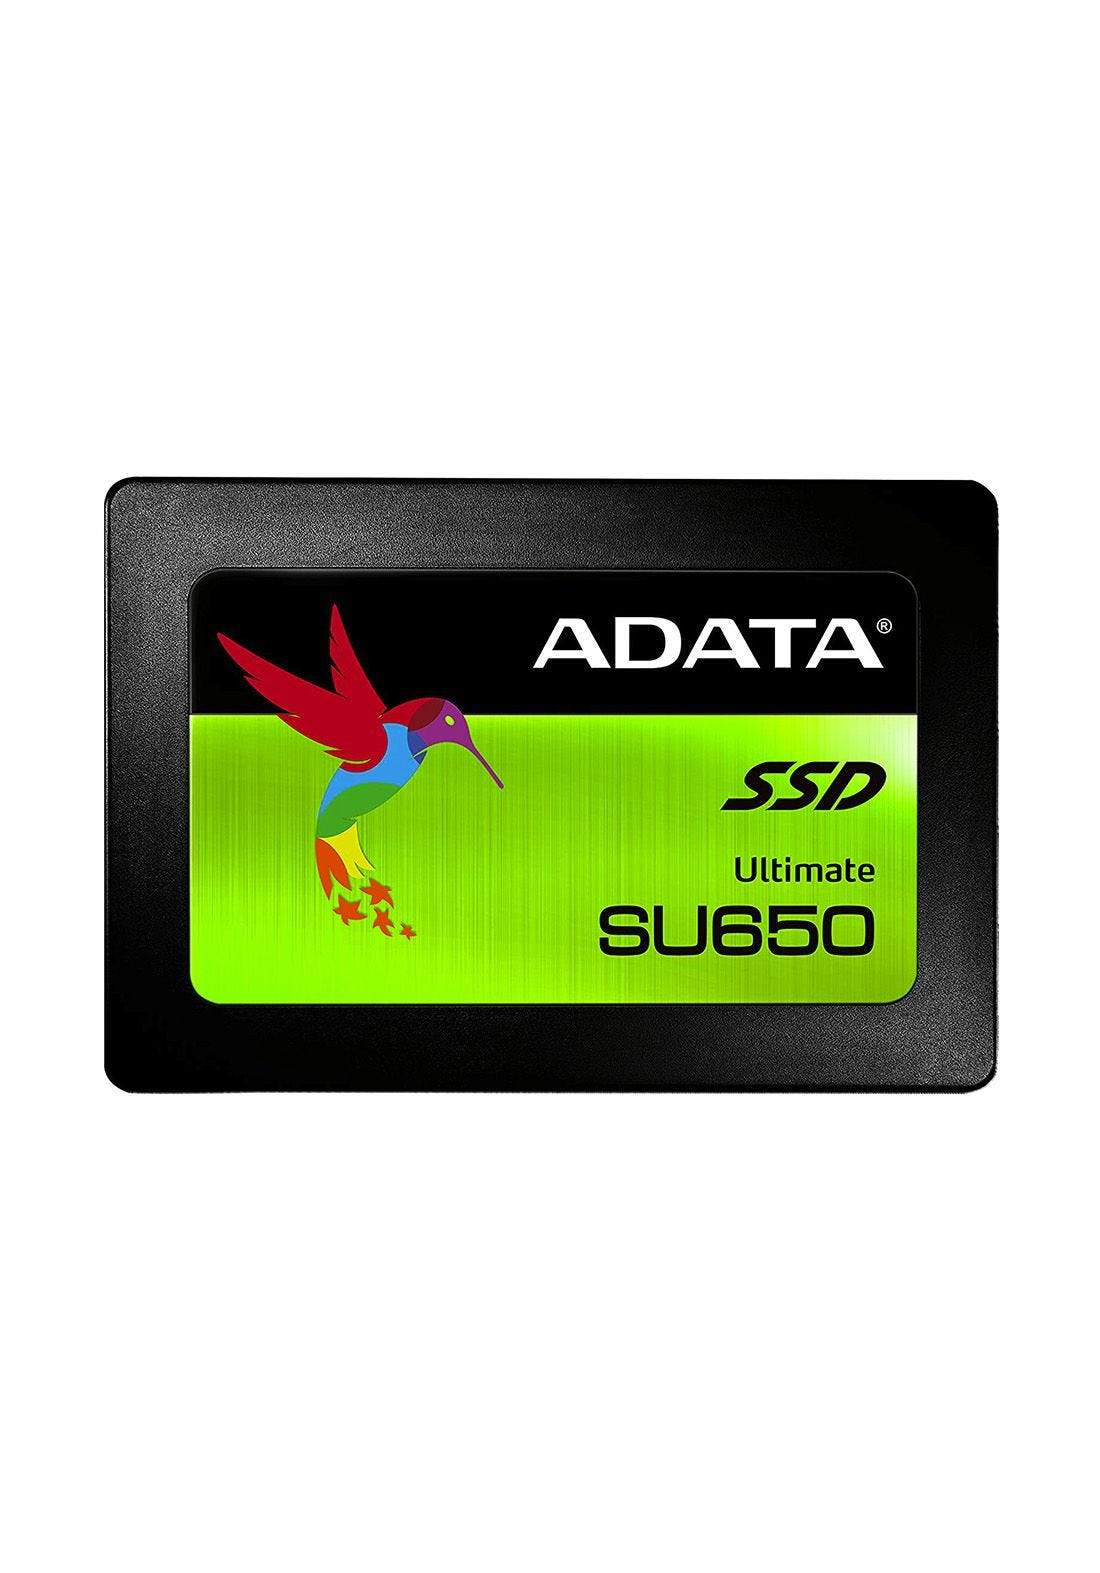 Adata 256Gb Ultimate Su650 Internal Solid State Drive - Black هارد داخلي